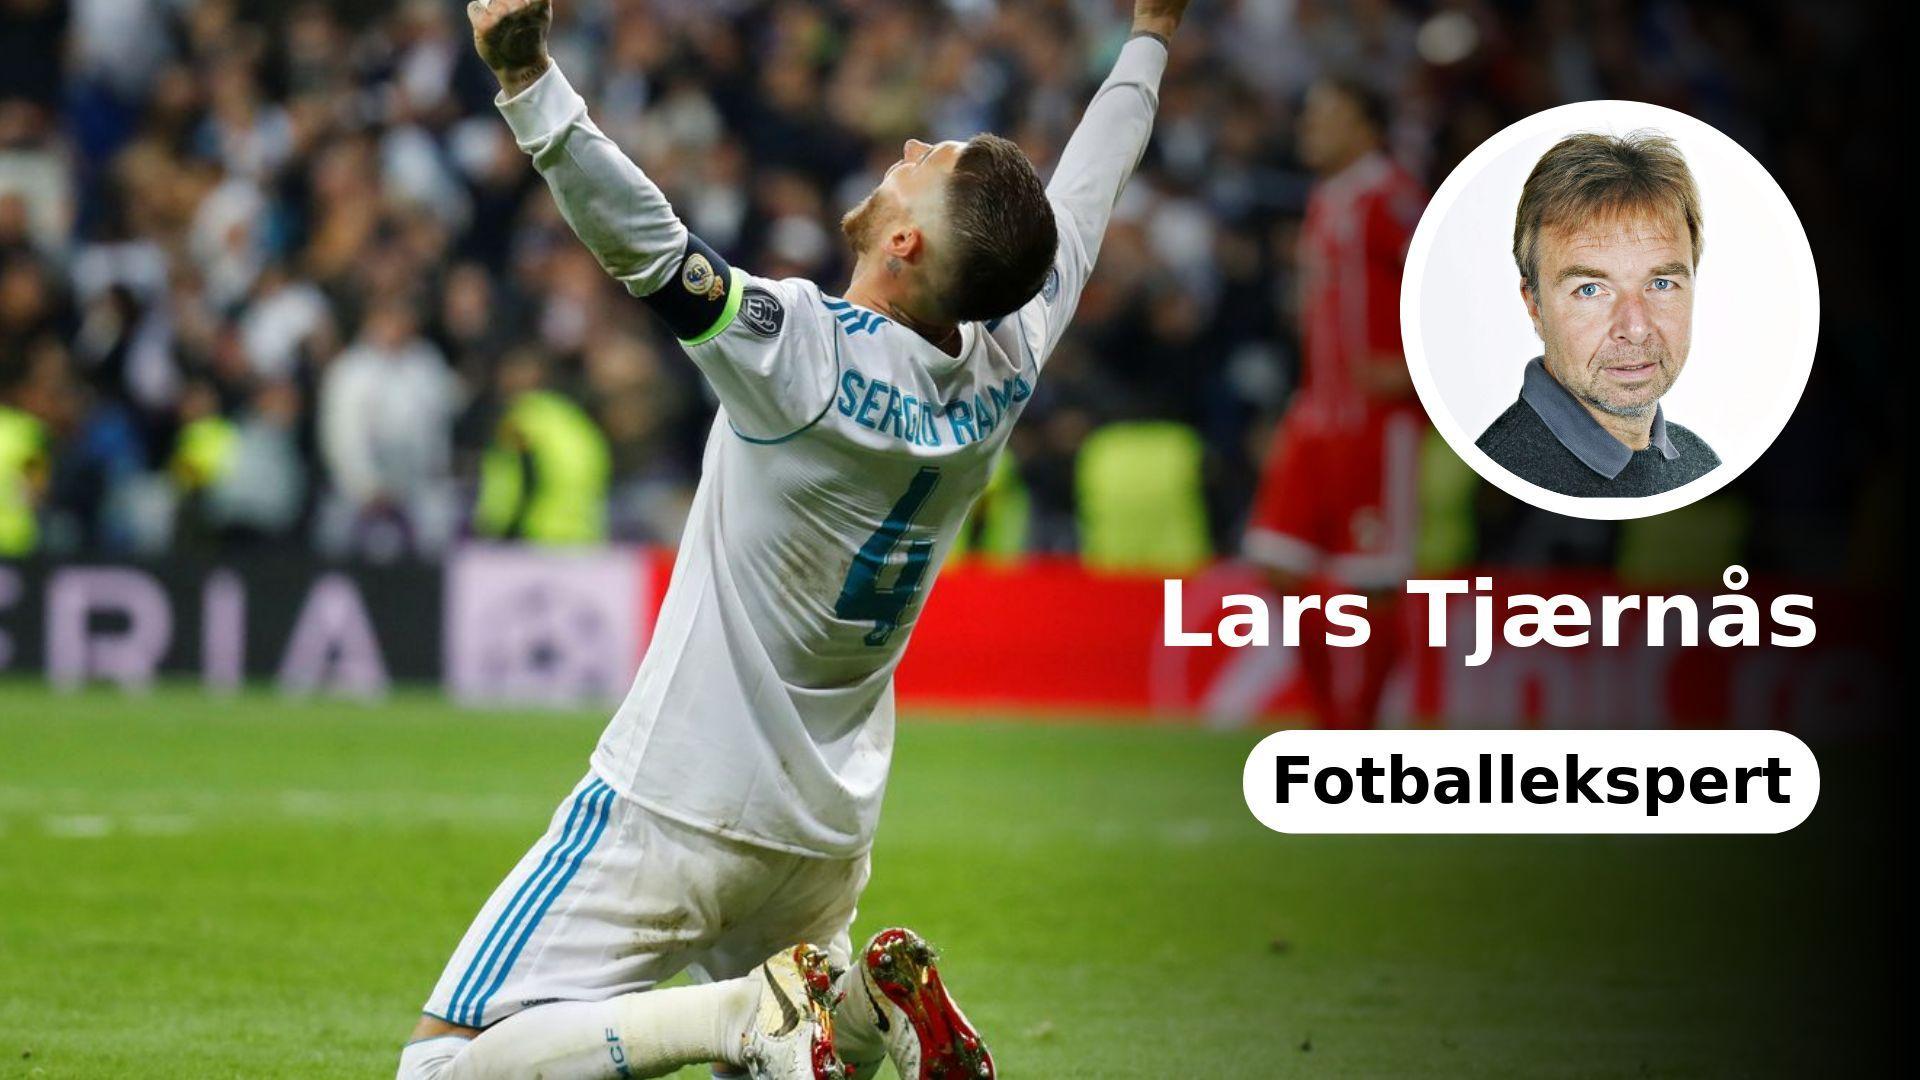 56e3e42f Real Madrid er i sin tredje finale på rad. Det burde ikke være mulig i en  idrett med så små marginer. - Stavanger Aftenblad